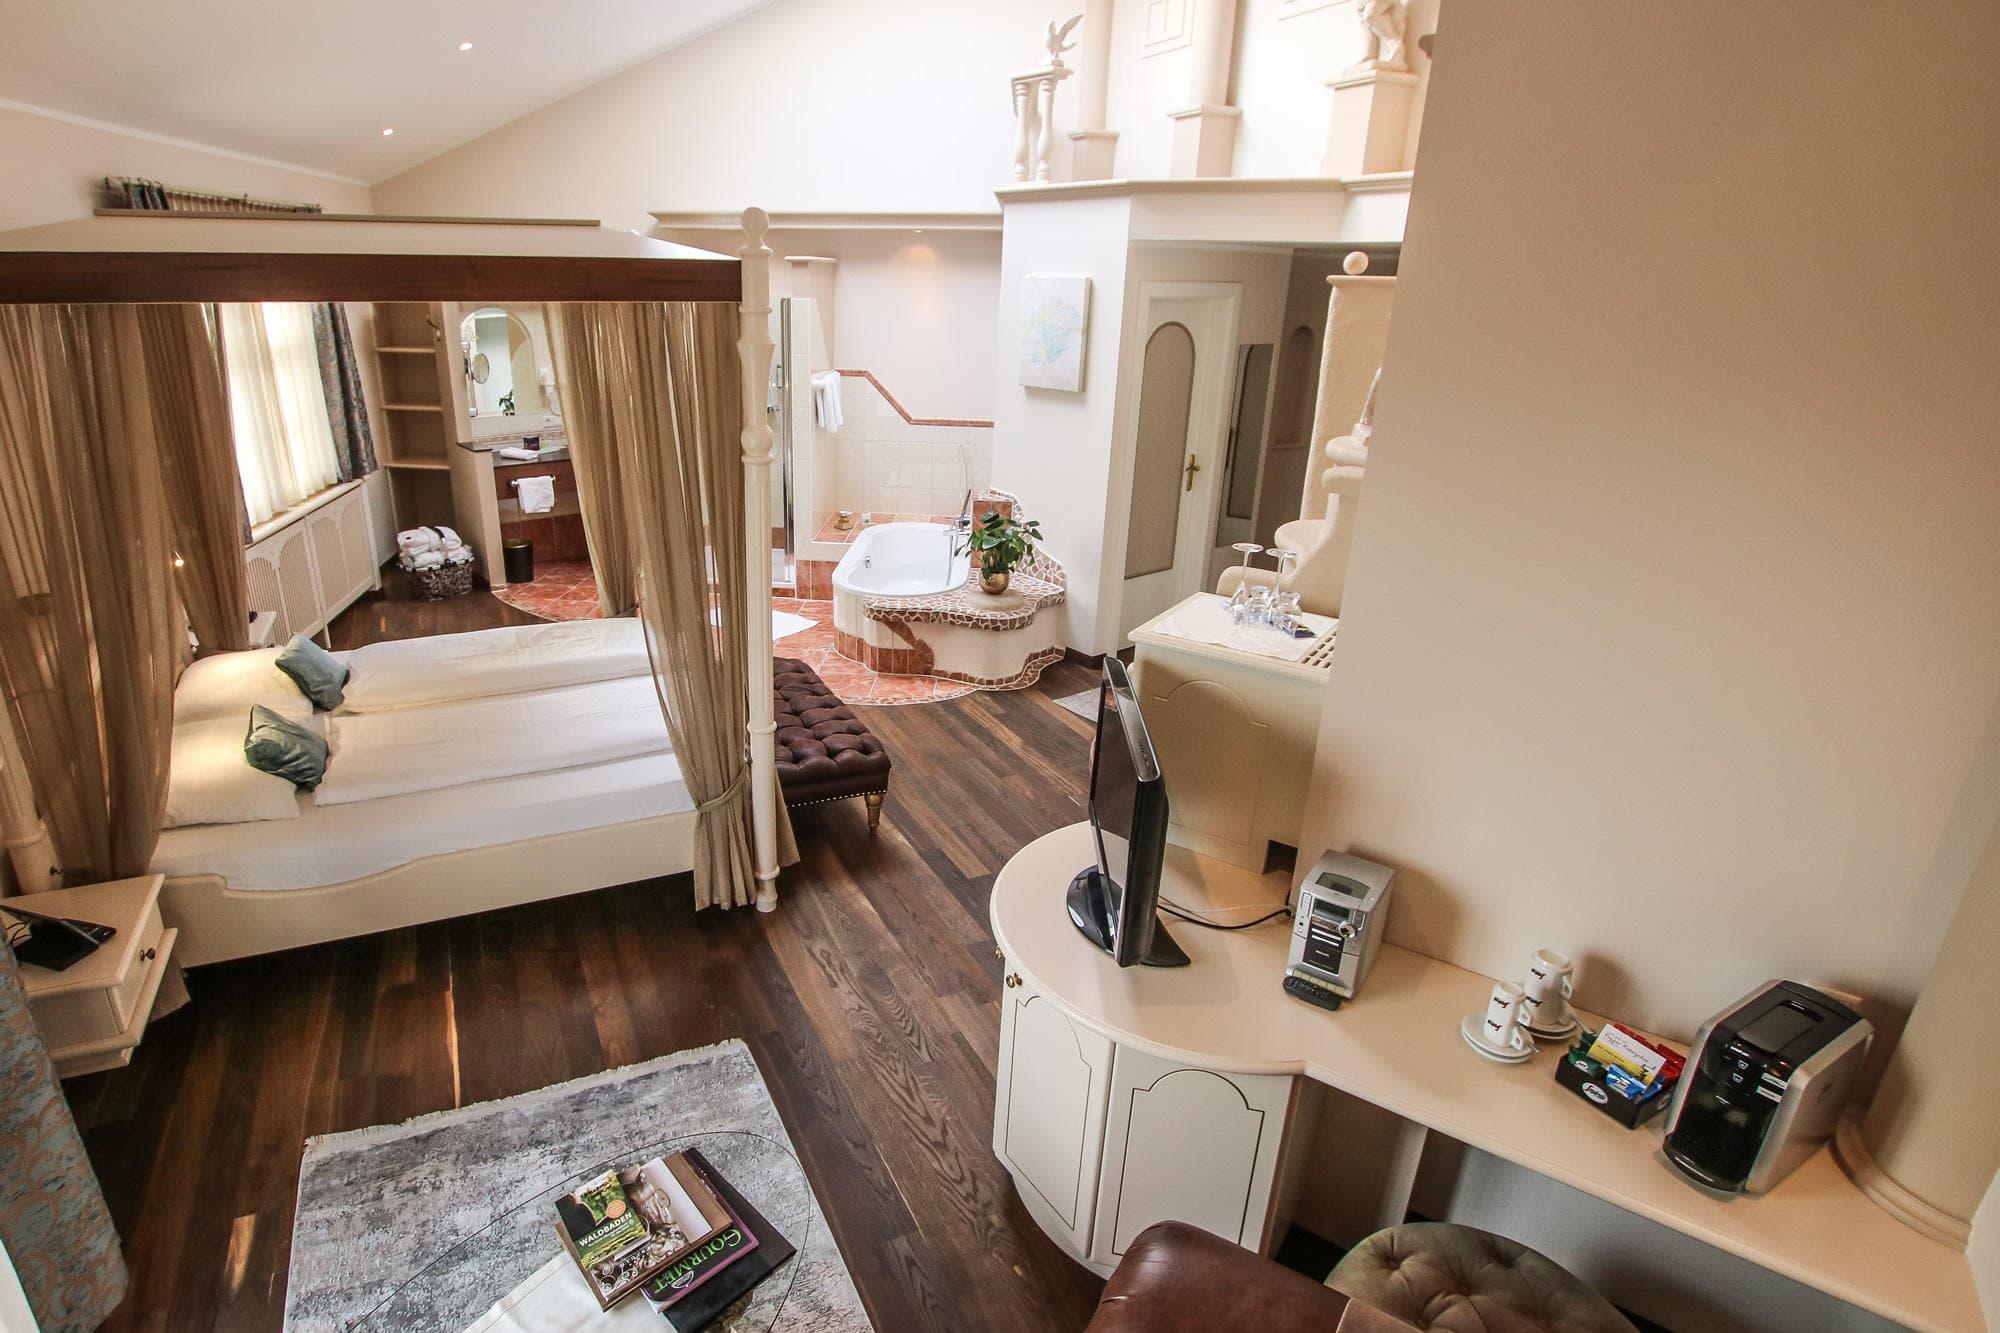 Luft & Liebe Suite - Hotel BERGERGUT ****S Loveness